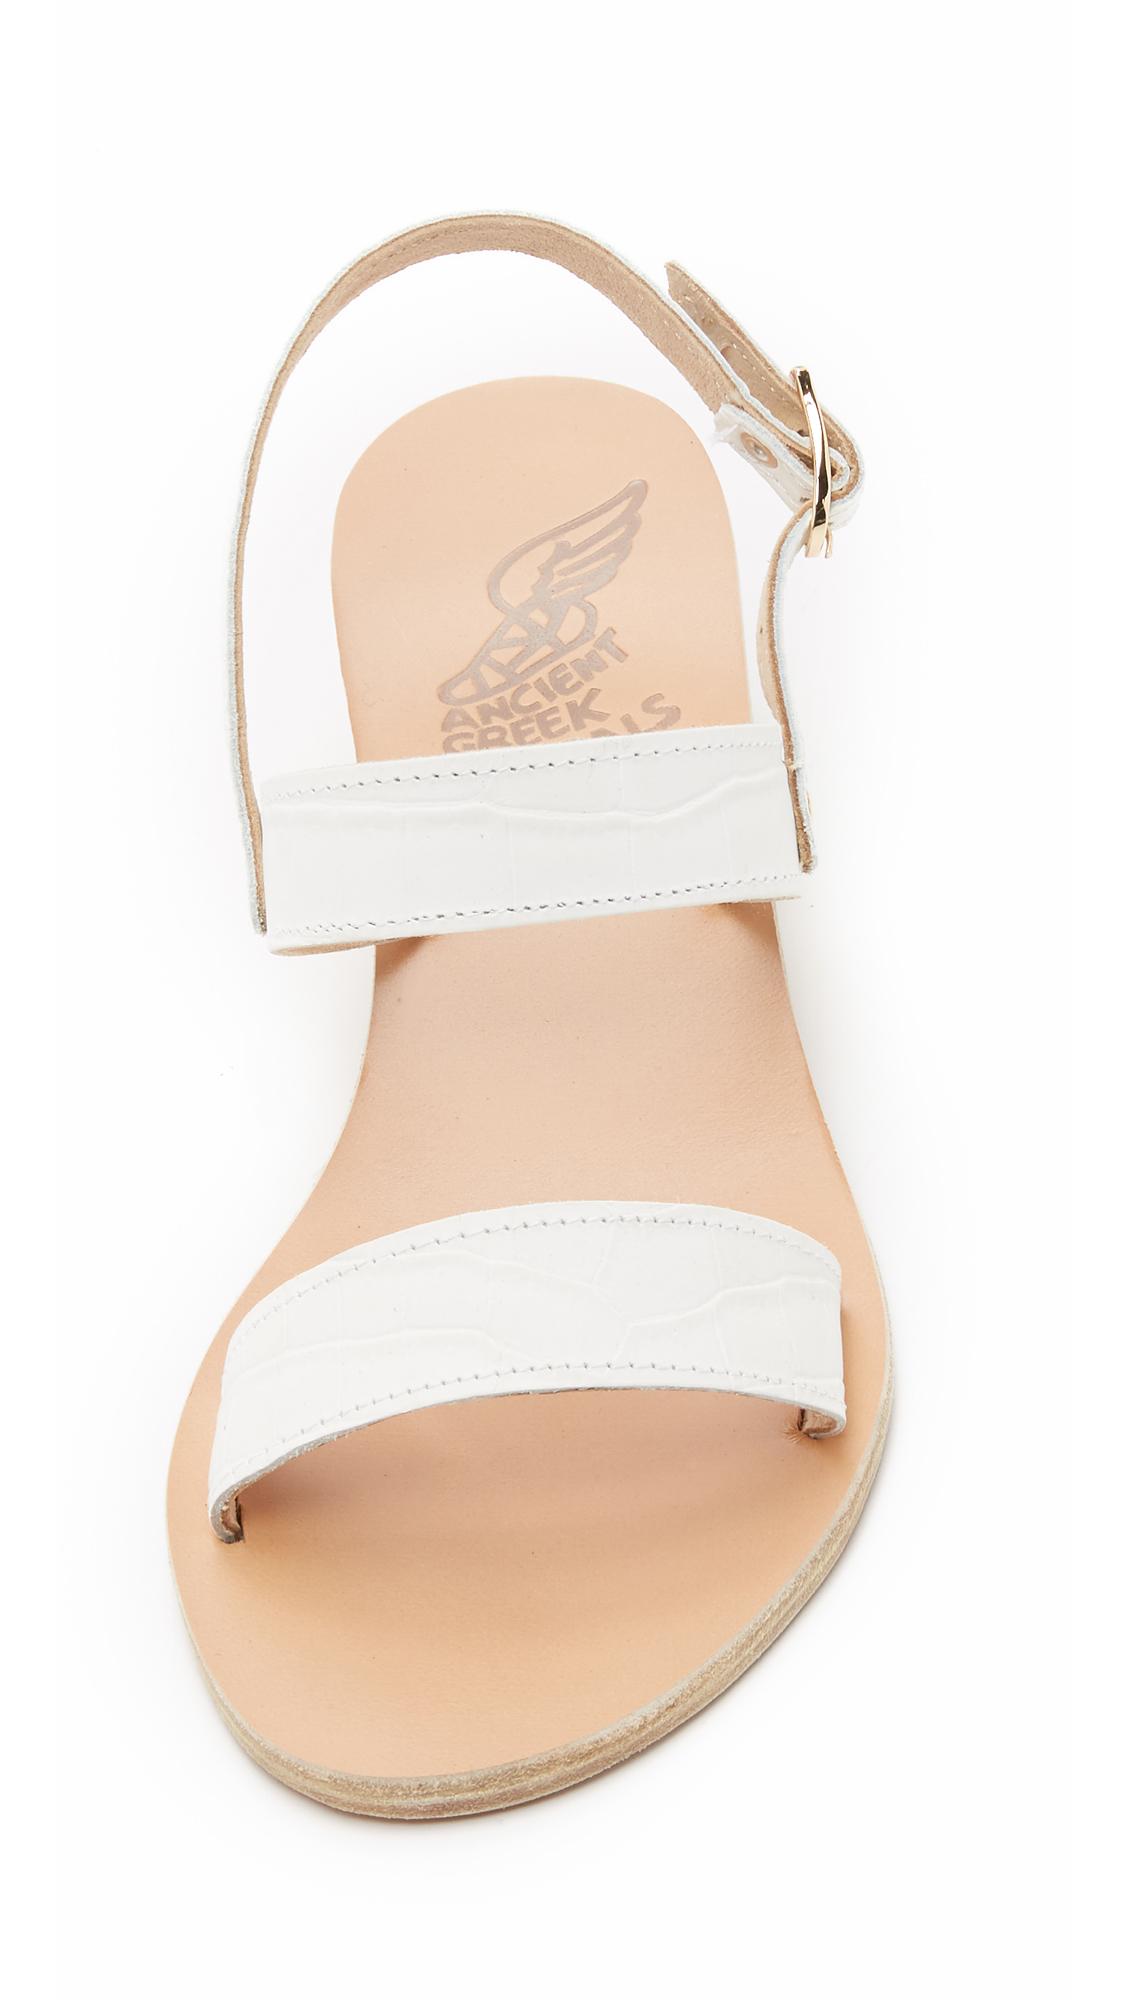 14dfbca4ec6 Lyst - Ancient Greek Sandals Clio Wedge Sandals - White in White